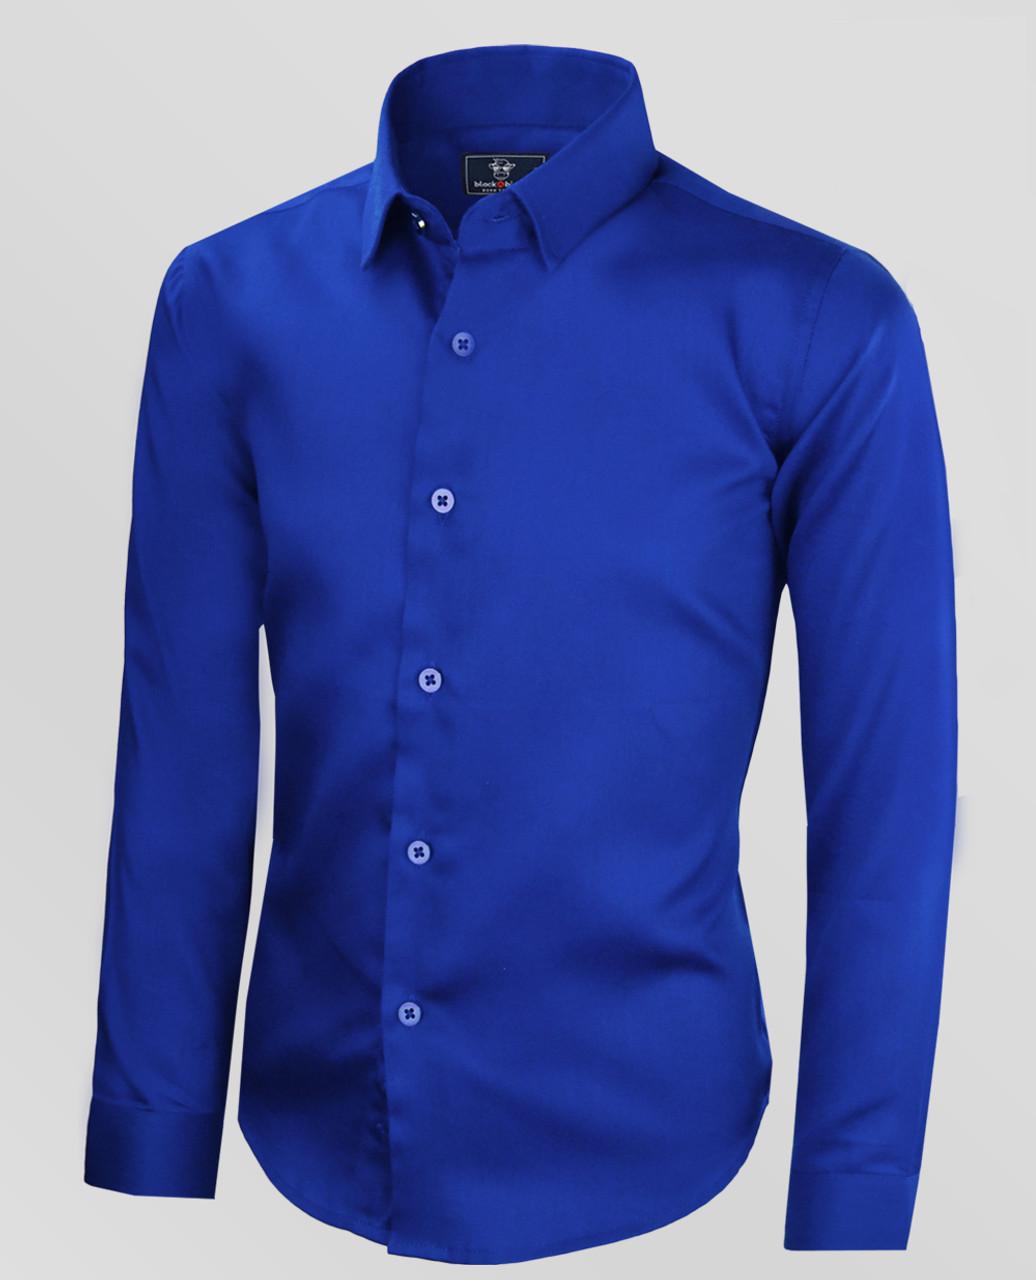 Black Shirt Design For Boys